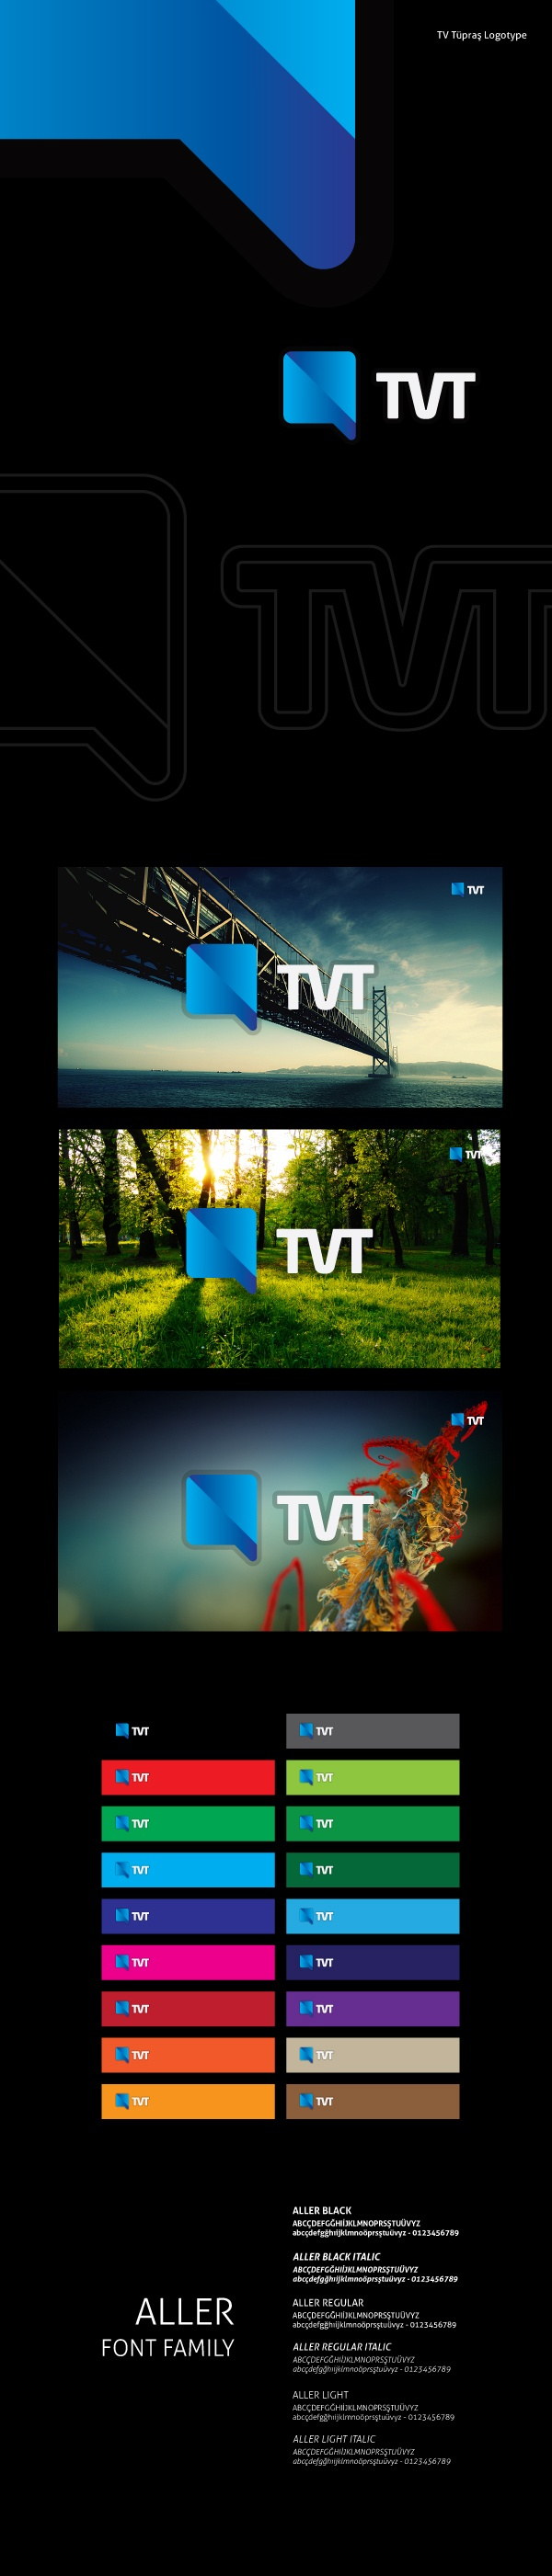 Cassandra cappello graphic design toronto - Tv Tupras Logo Design On Behance